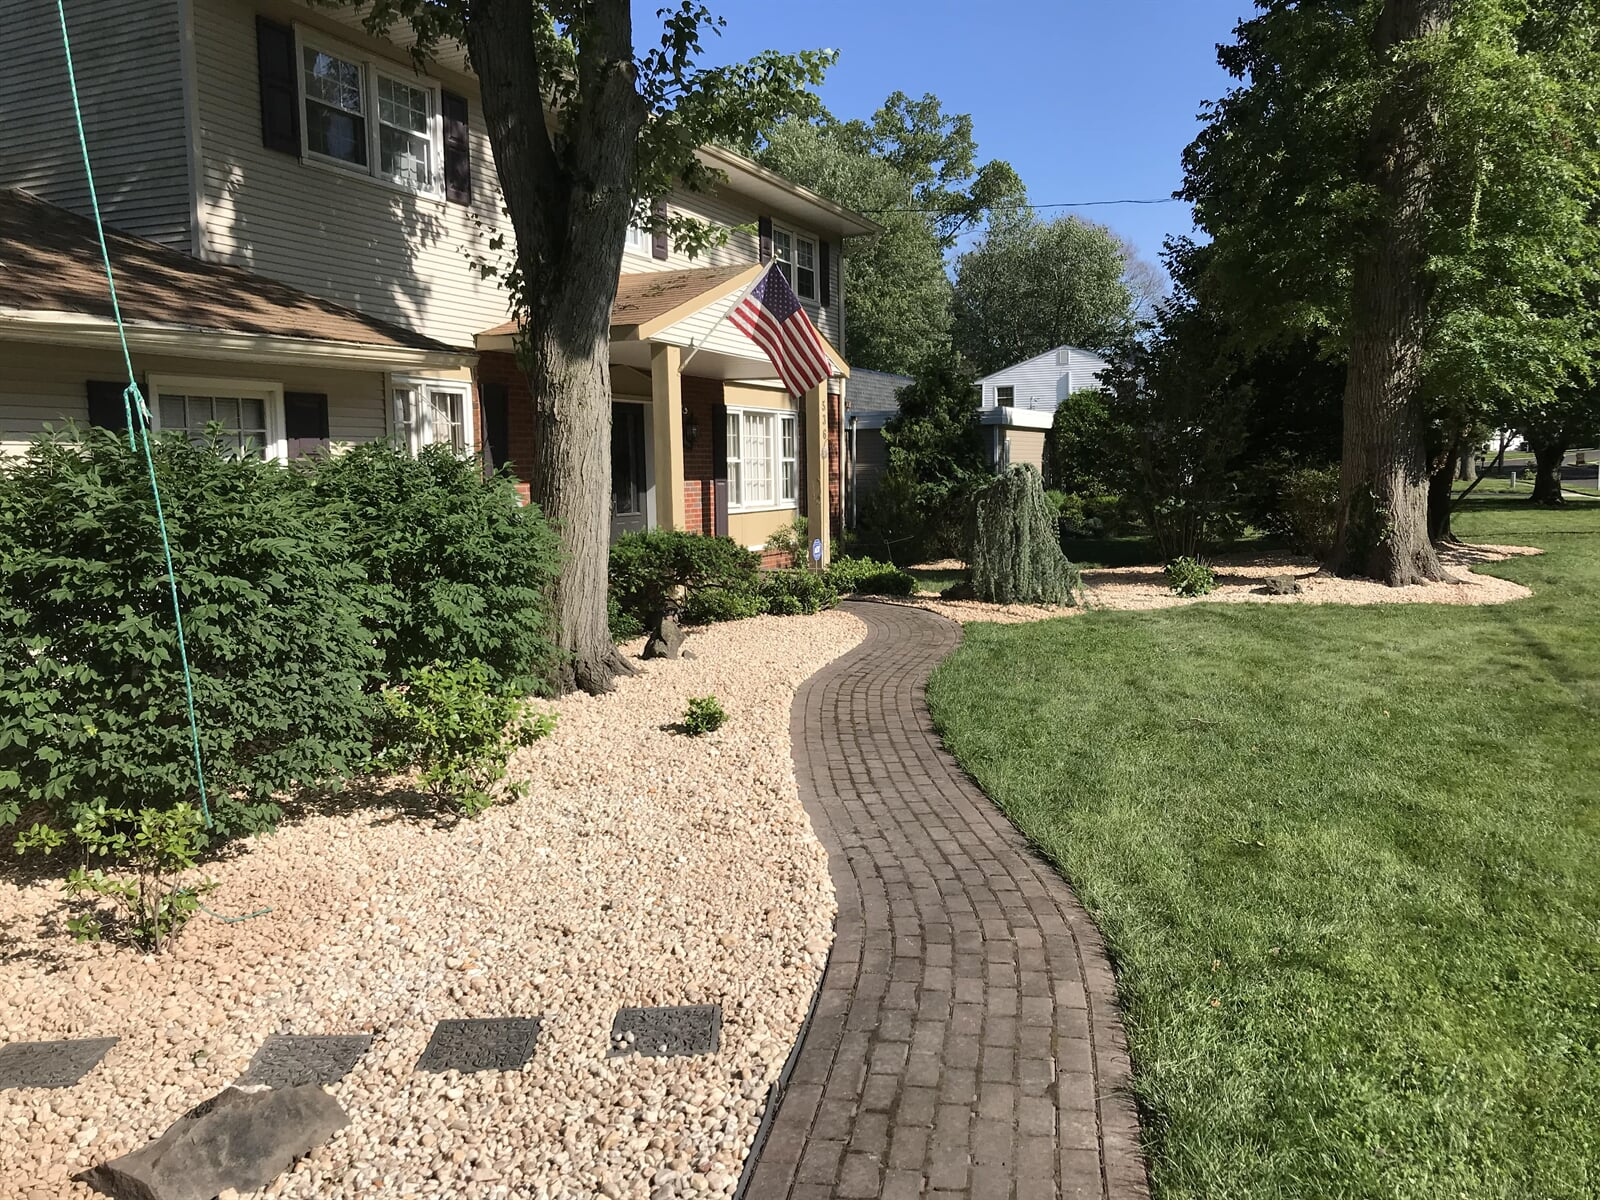 Brick Walkway up to House